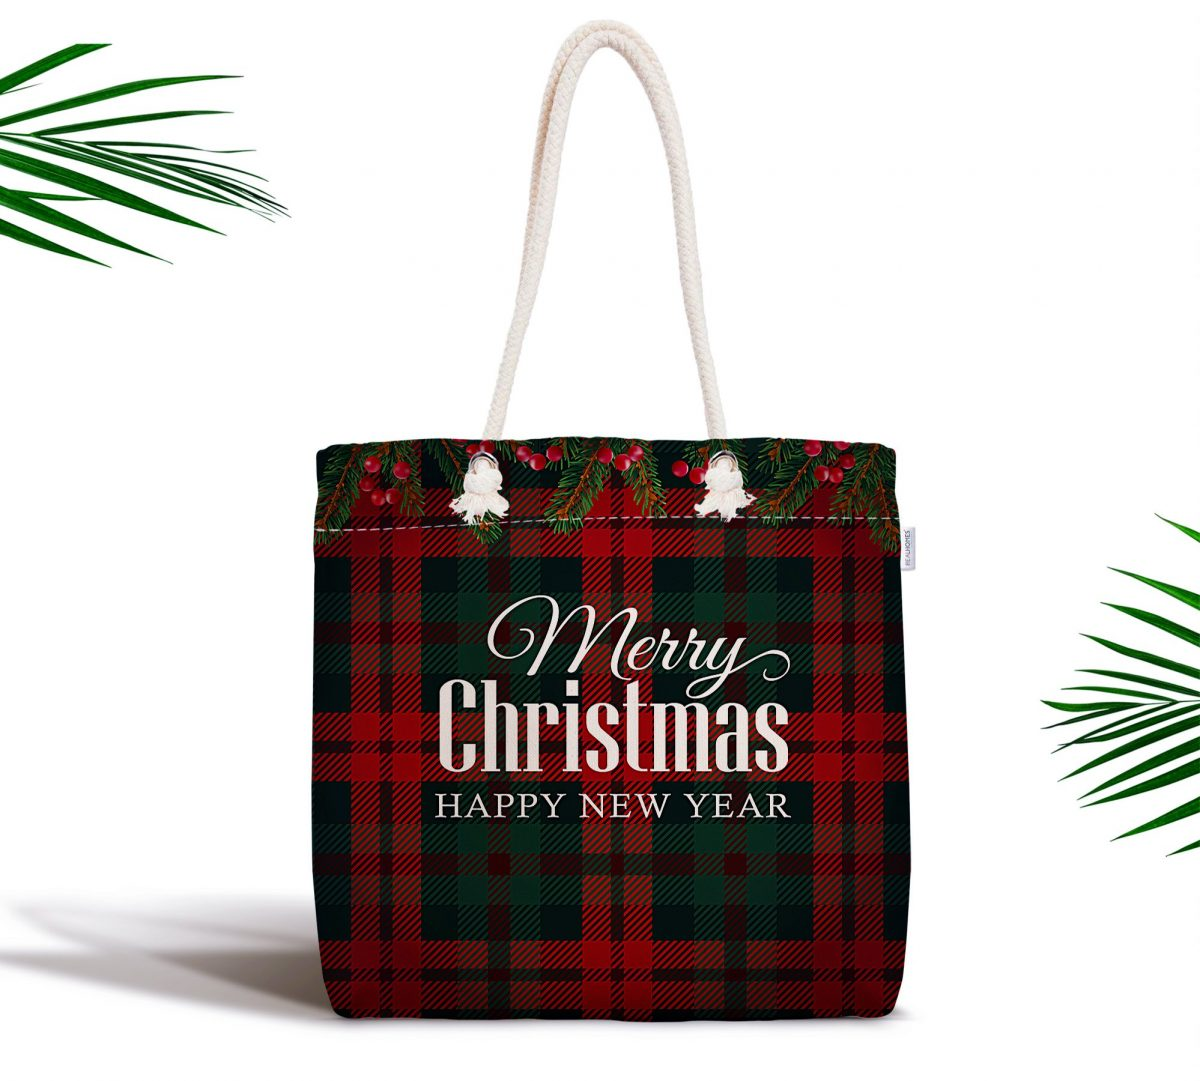 Ekose Zeminde Merry Christmas Baskılı Fermuarlı Modern Kumaş Çanta Realhomes